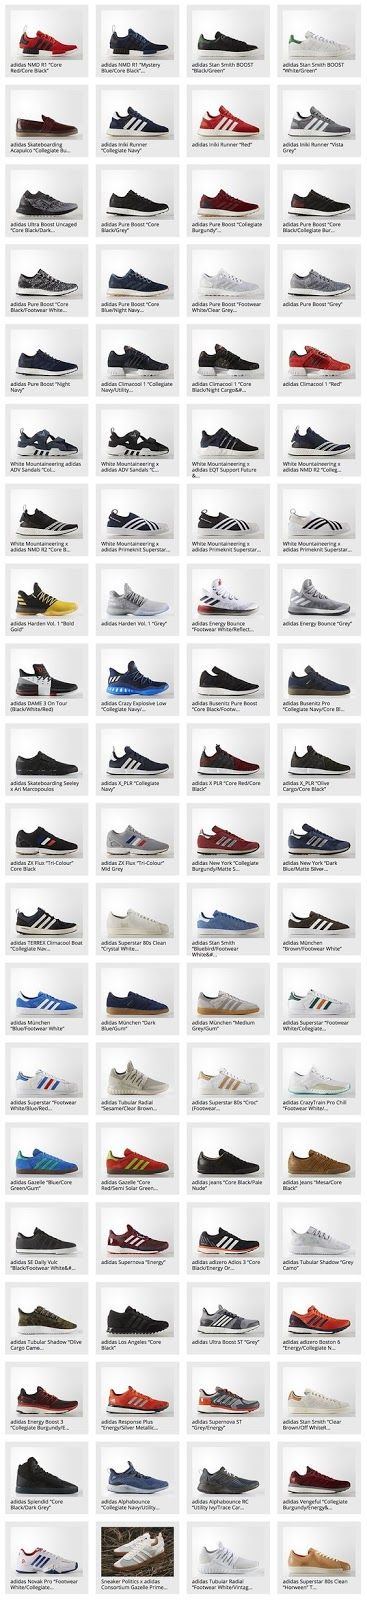 adidas ragazzo scarpe 2017